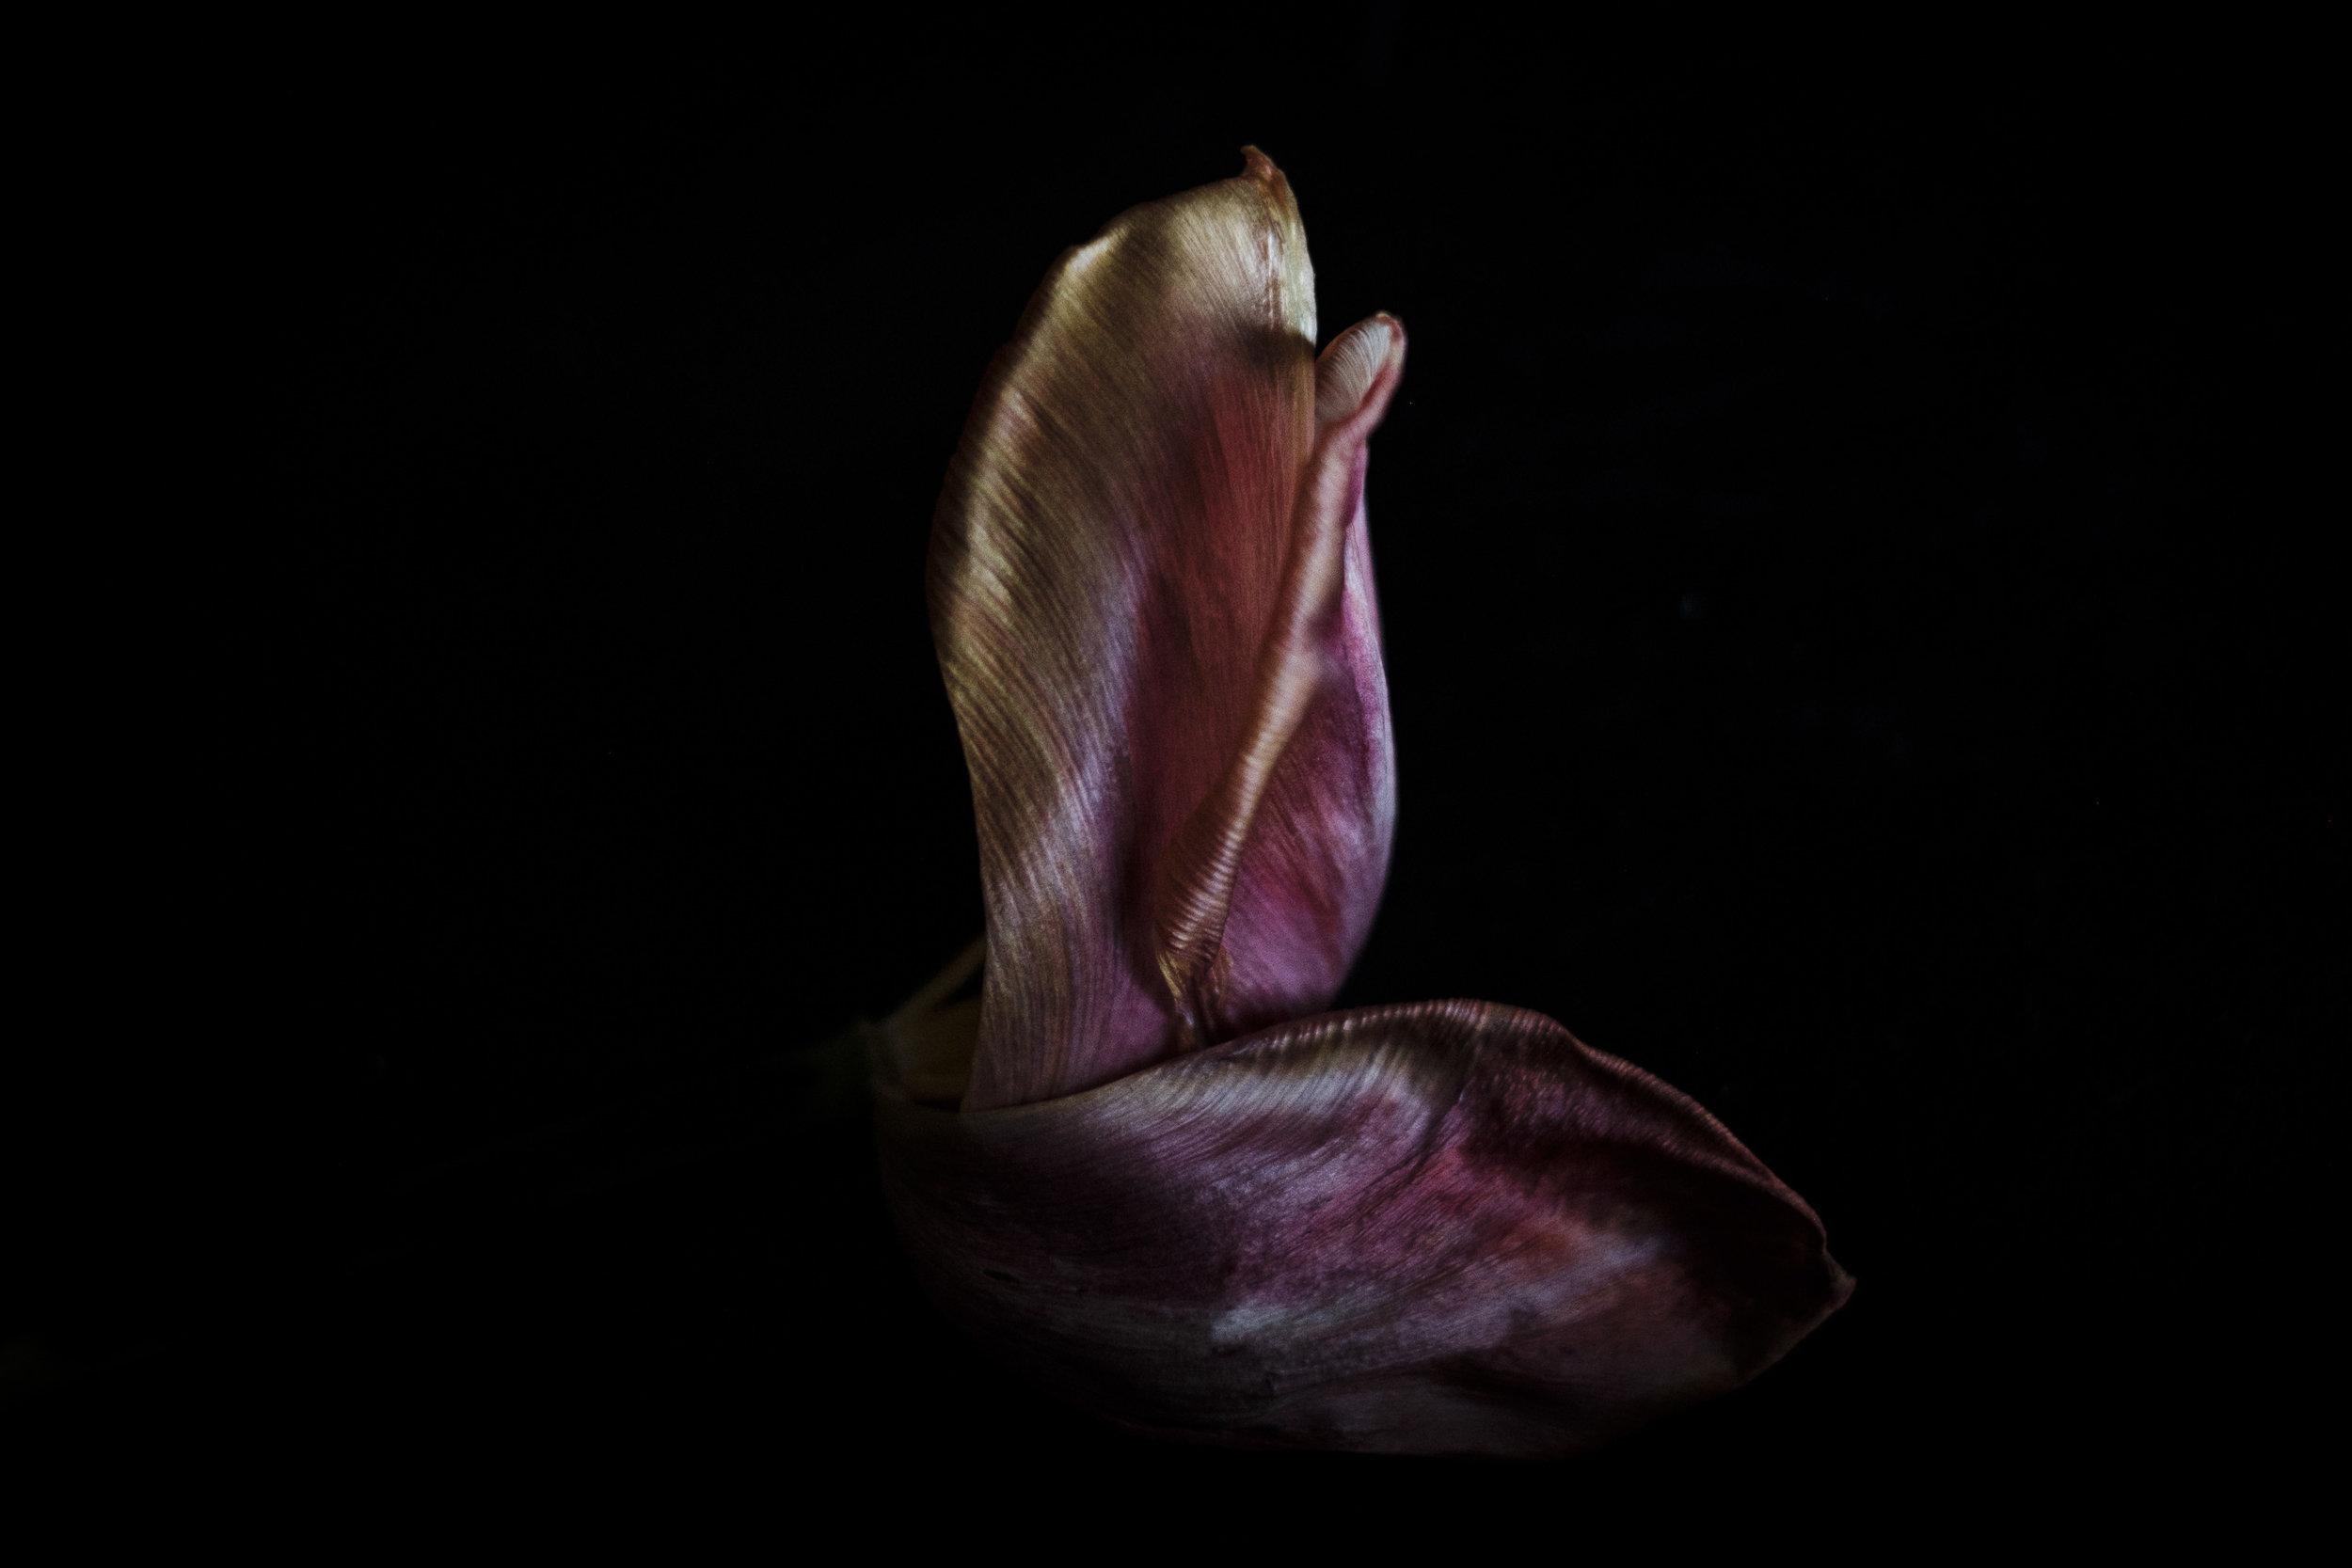 Richard-Stow-Flowers-0455.jpg